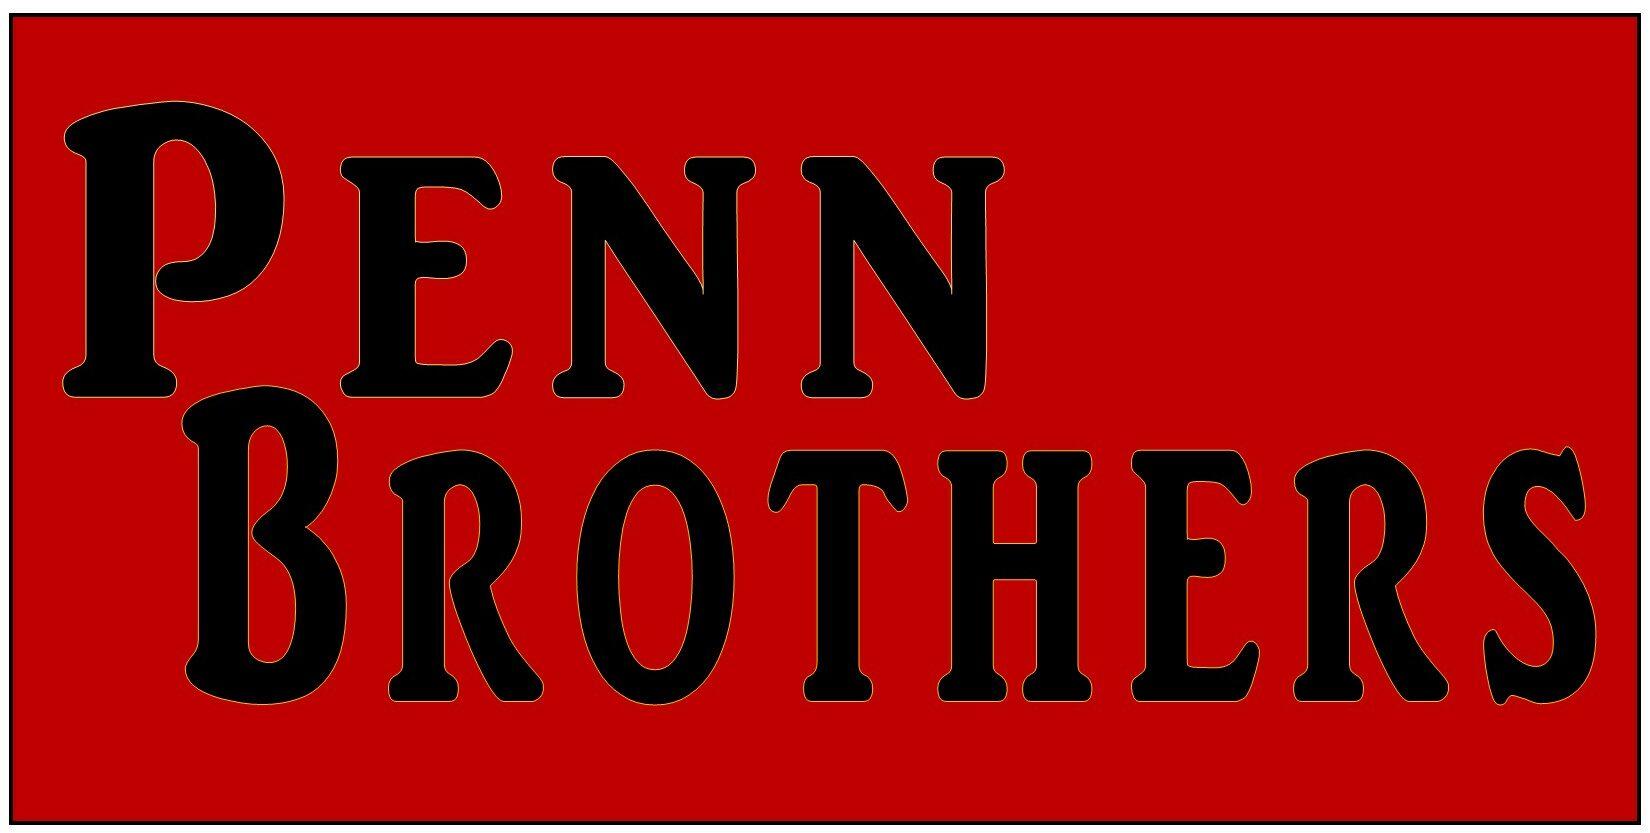 Penn Brothers